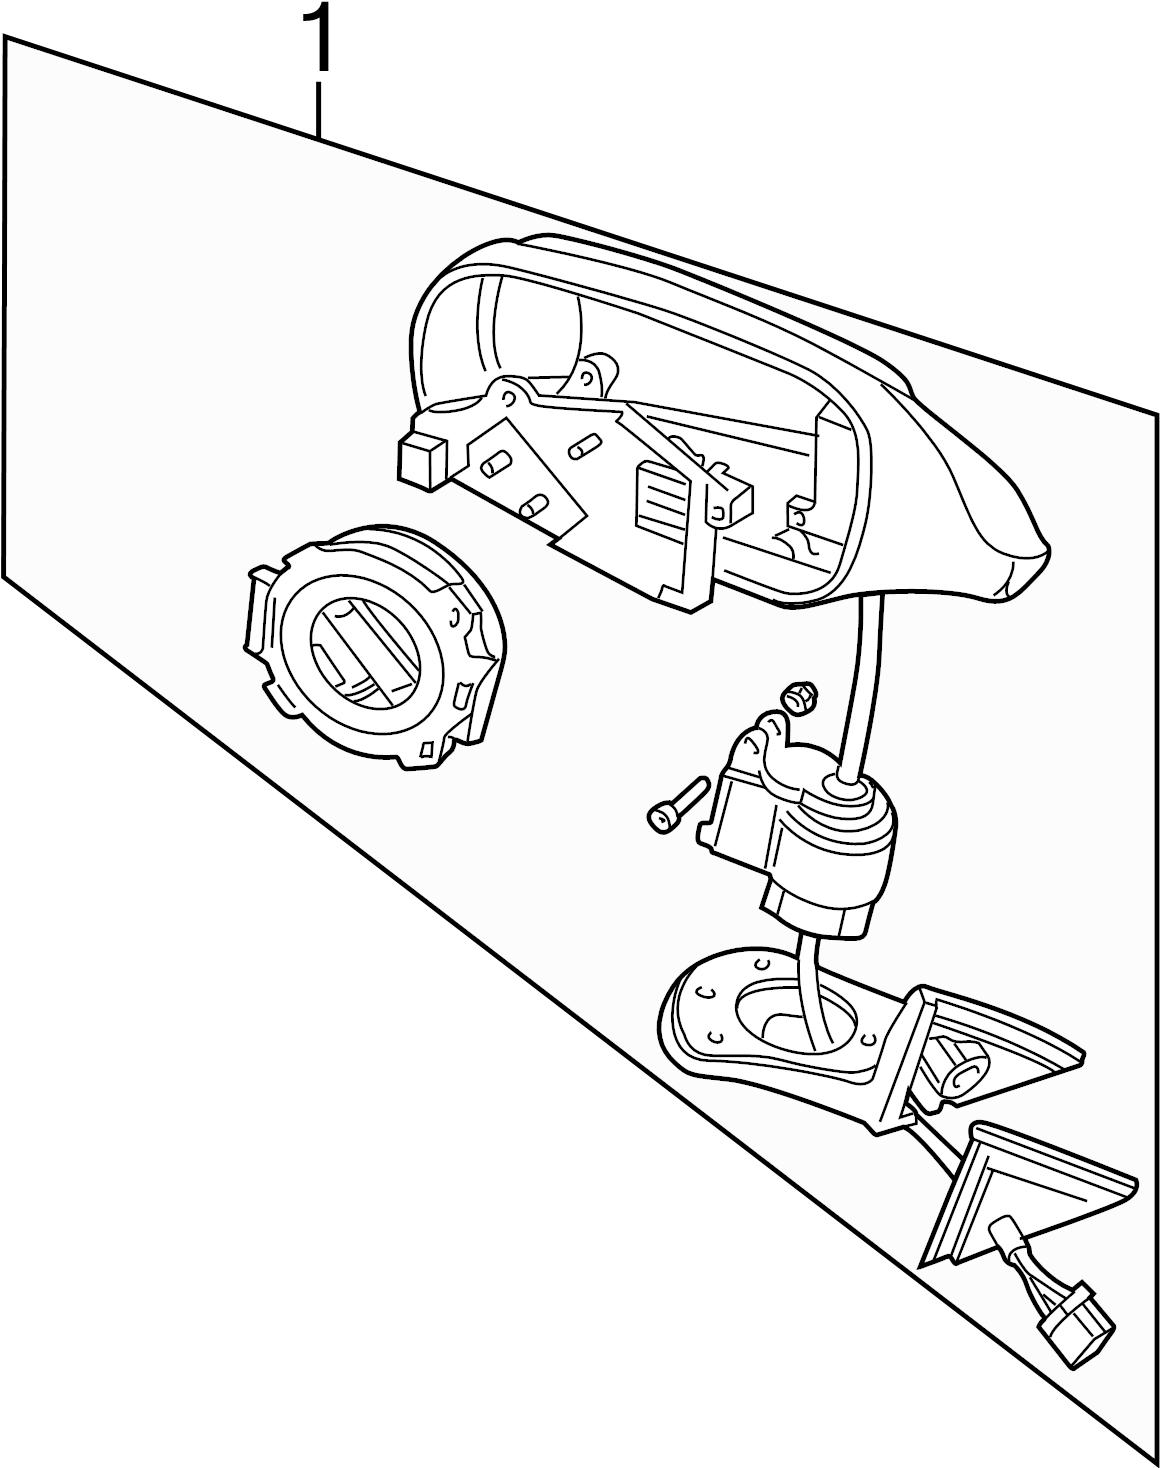 Jaguar Xj6 Door Mirror Drive Motor Memory Convertible